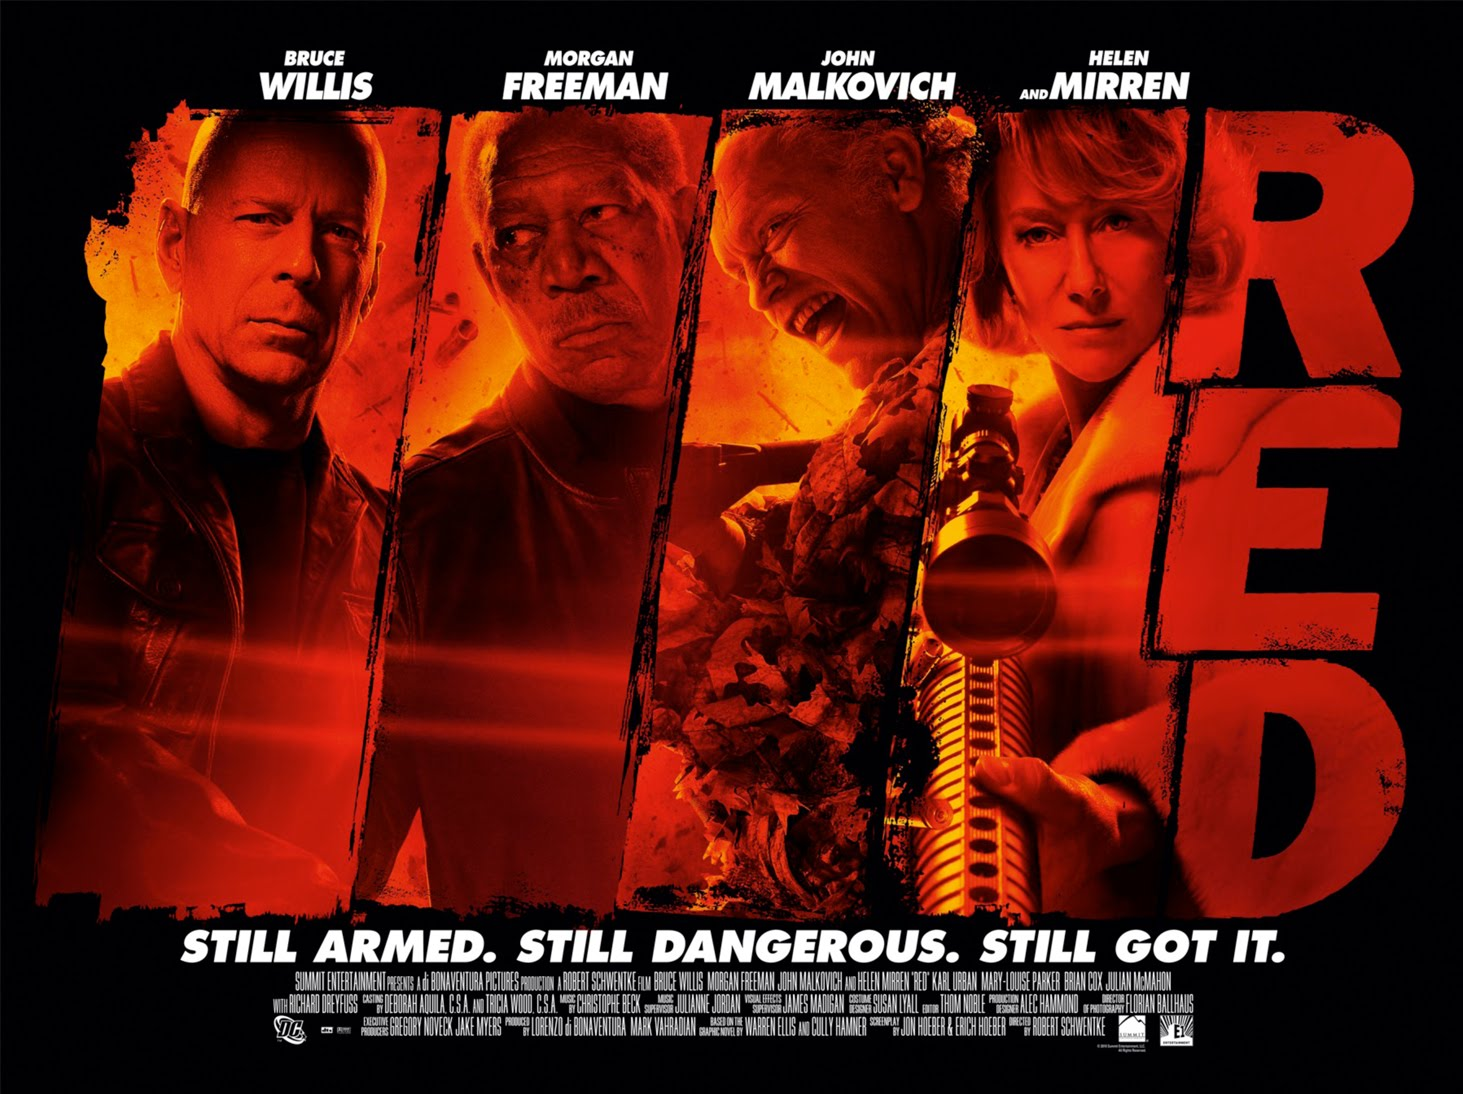 http://4.bp.blogspot.com/_ivWX1b9wiEw/TUS1JPamR6I/AAAAAAAADU8/yooI0NcM-VU/s1600/red-movie.jpg